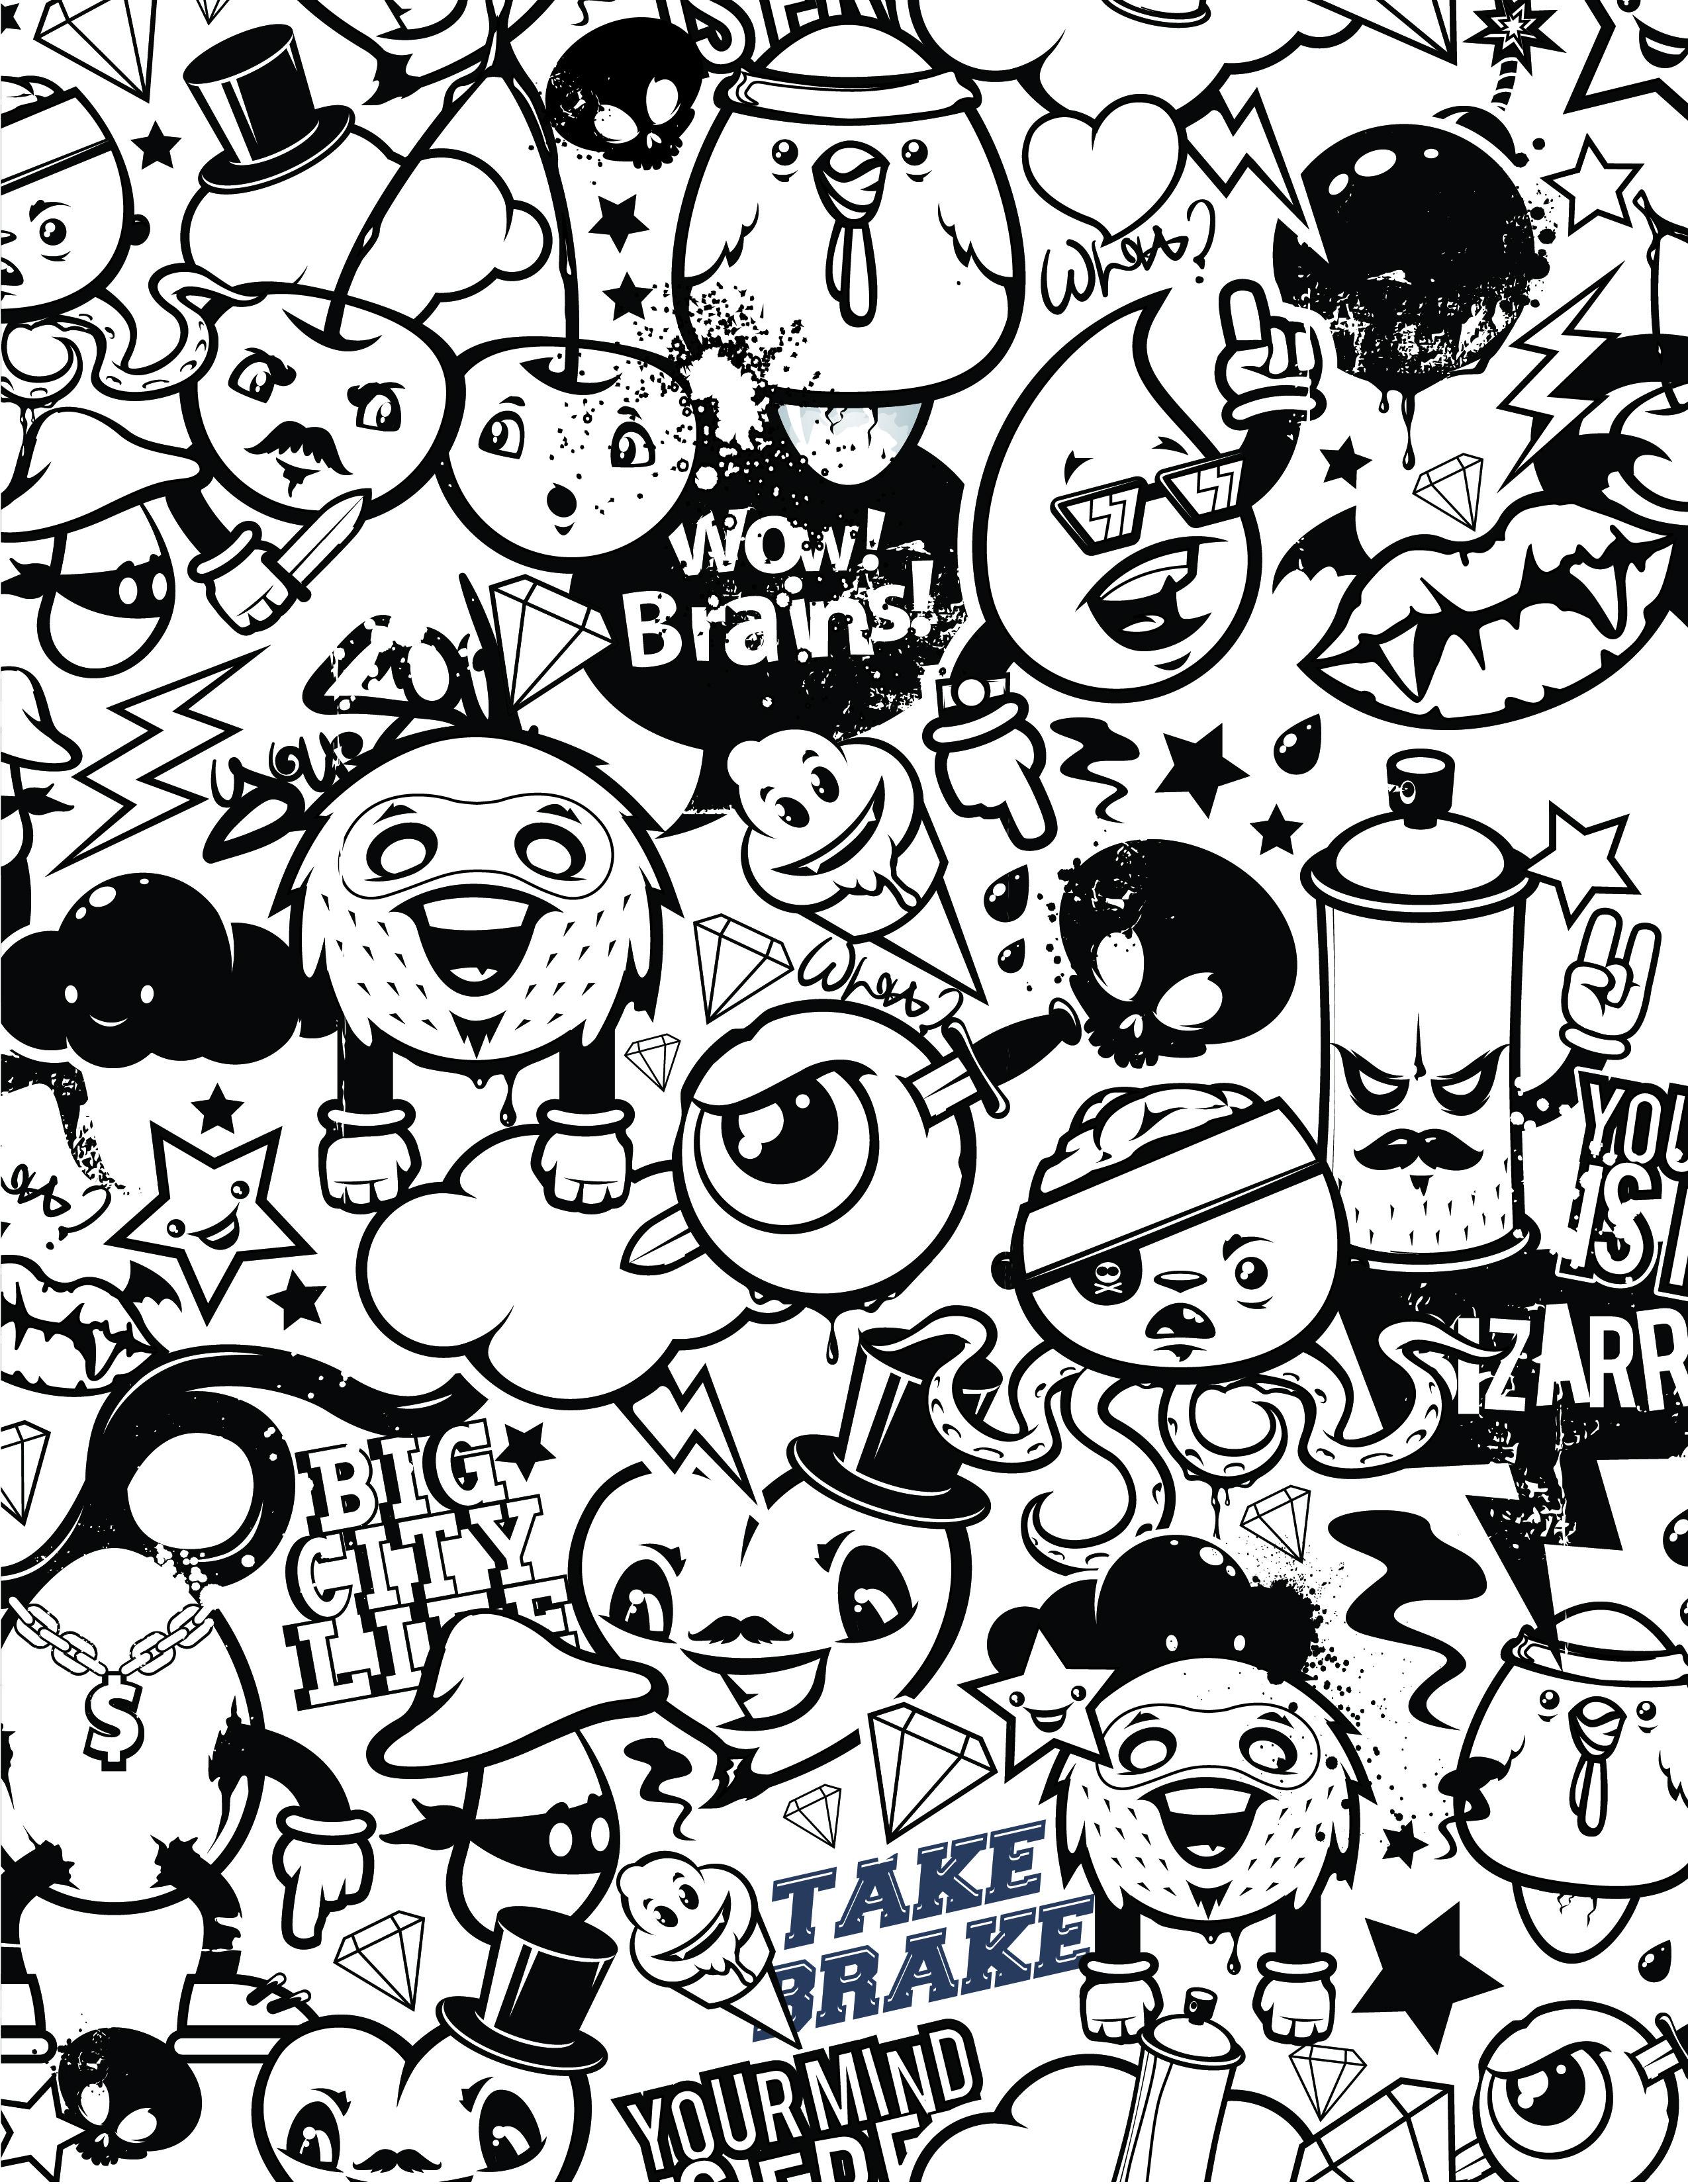 Coloriage Emoji Difficile.Graffiti Coloriage Emoji Gestion Du Stress A Dessiner Gratuit